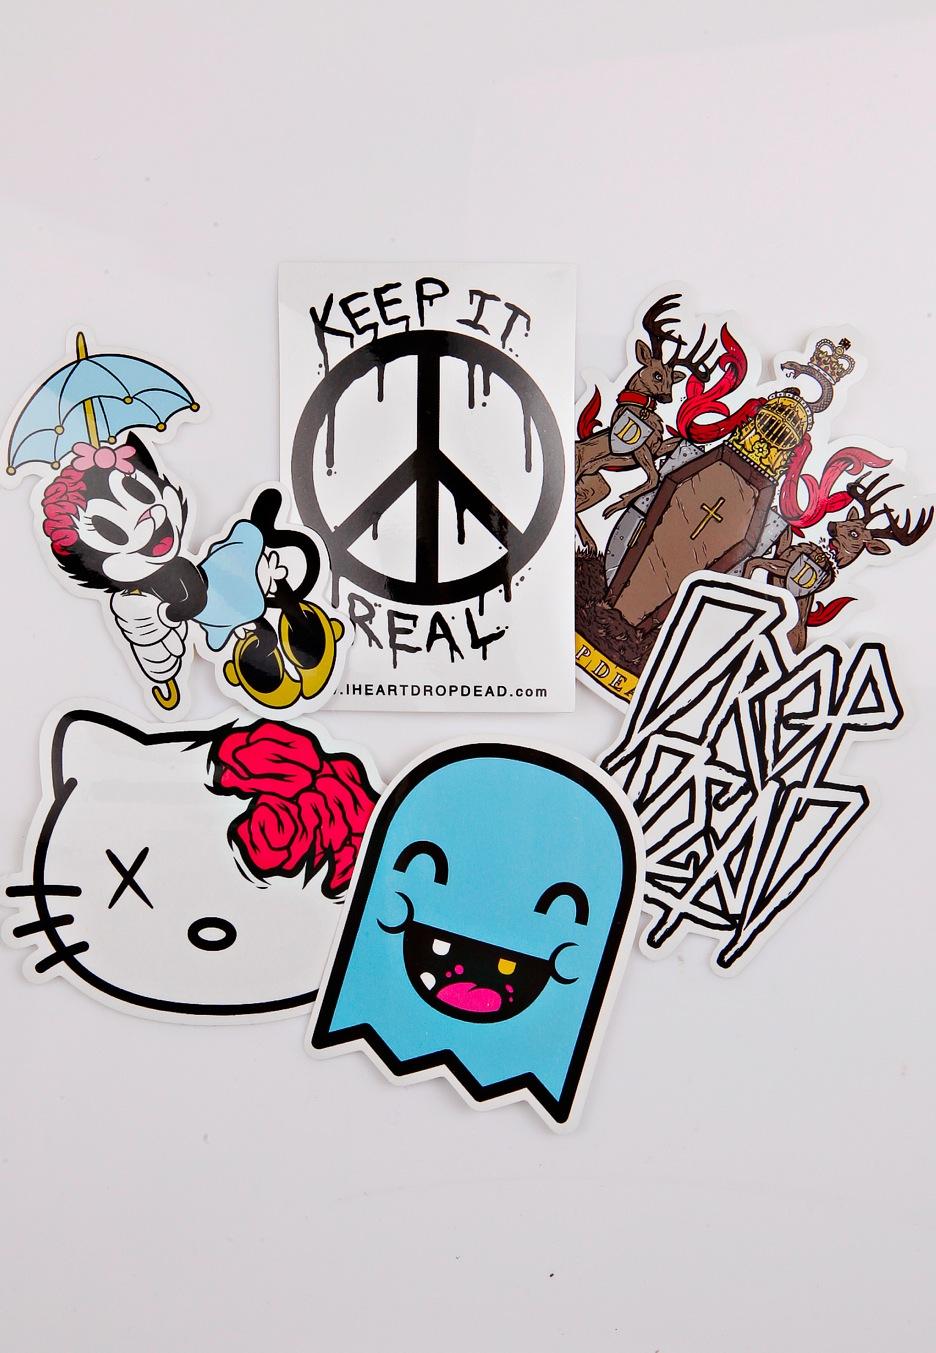 Drop Dead - Keep It Real - Sticker Pack - Impericon.com Worldwide